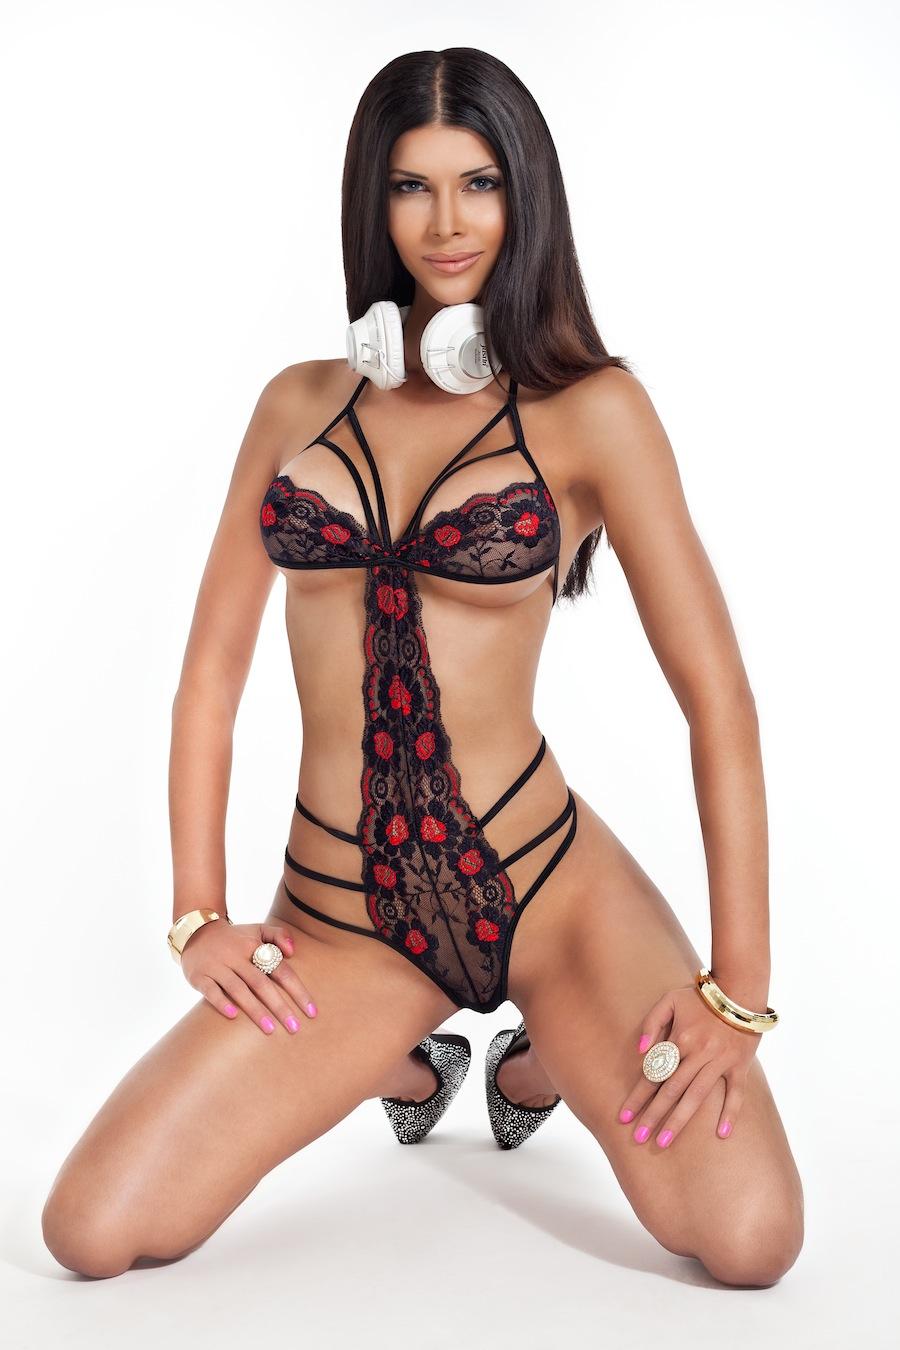 Micaela Schafer bellissima e super sexy dj e modella tedesca